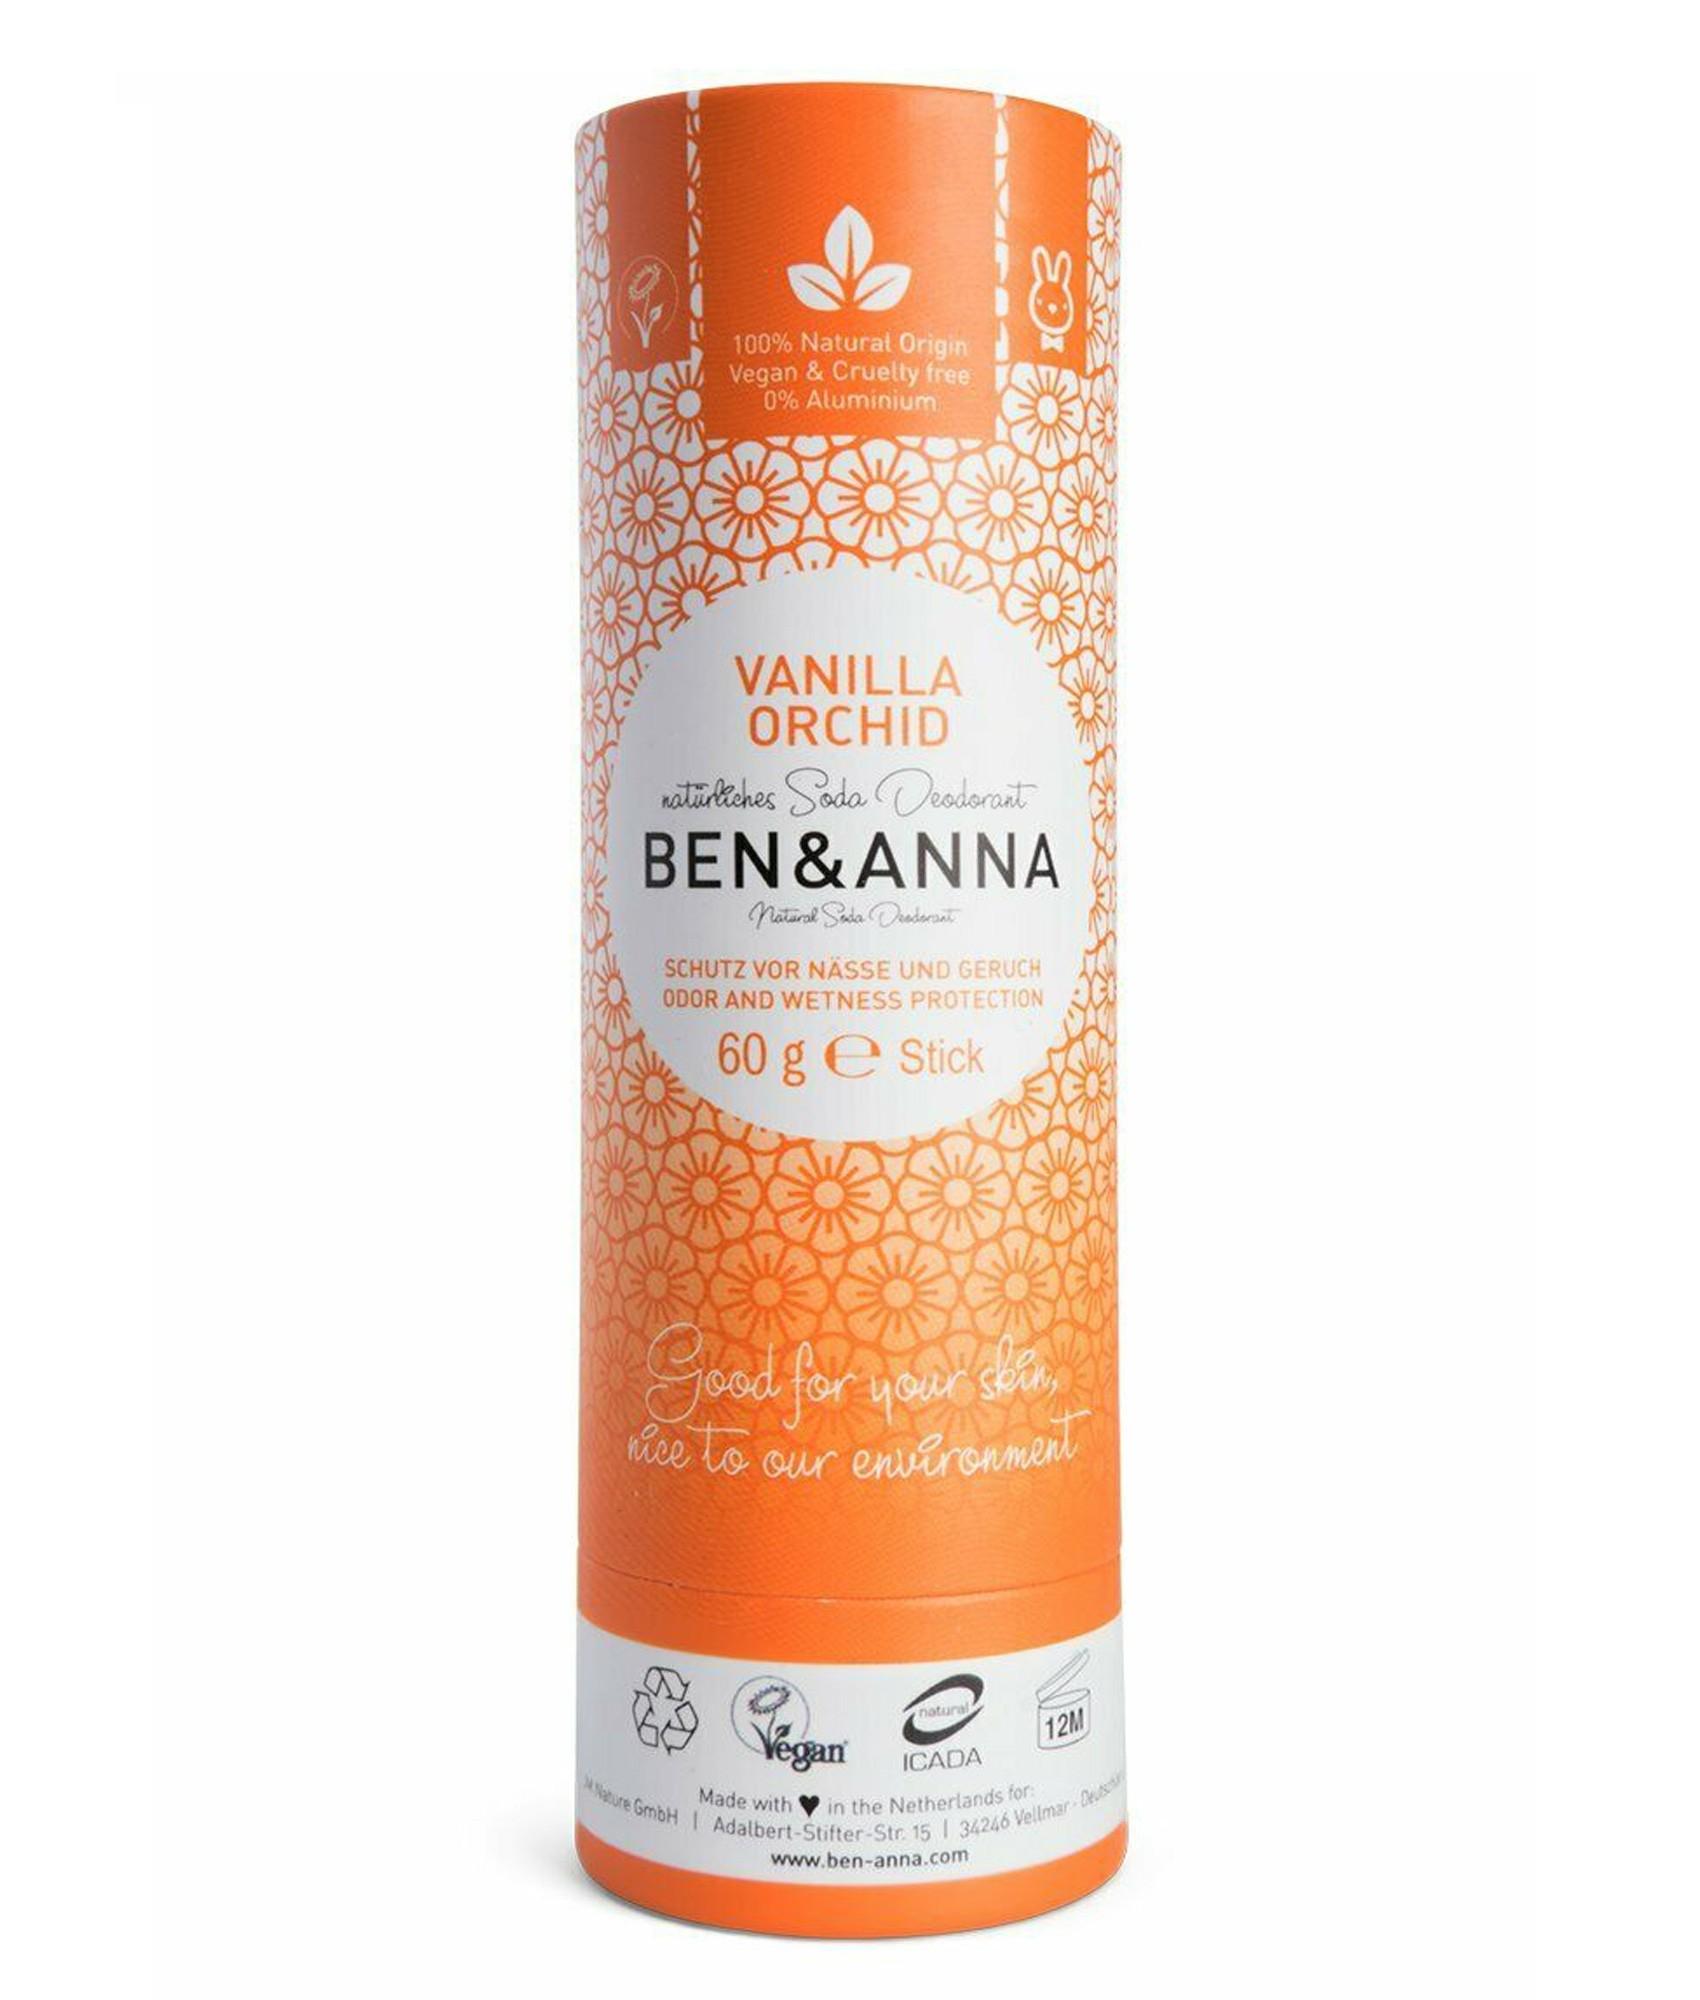 Ben & Anna Soda Natural Deodorant Vanilla Orchid